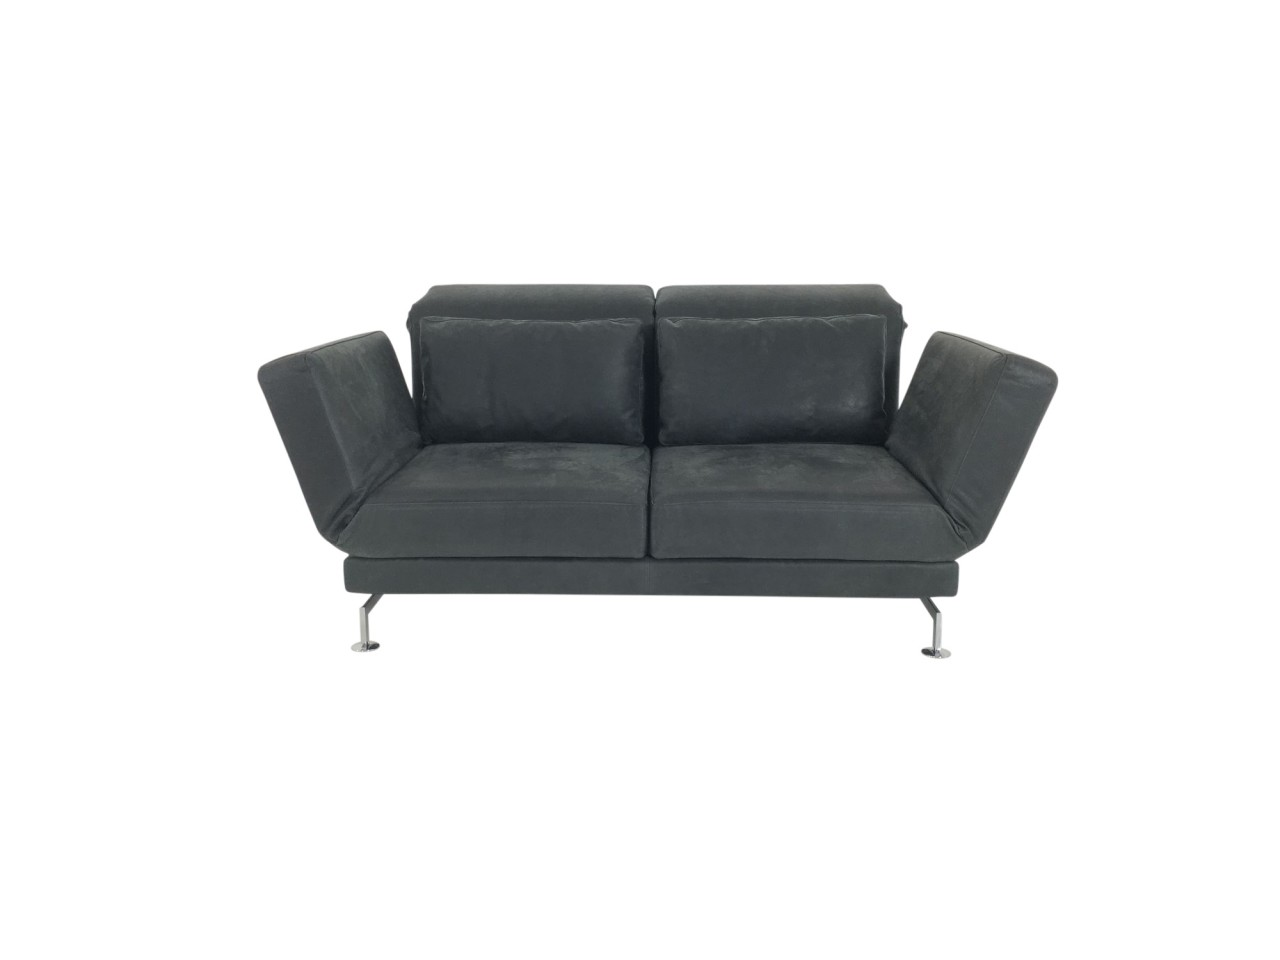 Brühl MOULE medium Sofa im dunkelgrauen Glove Leder mit 2 Drehsitzen und Chromkufen